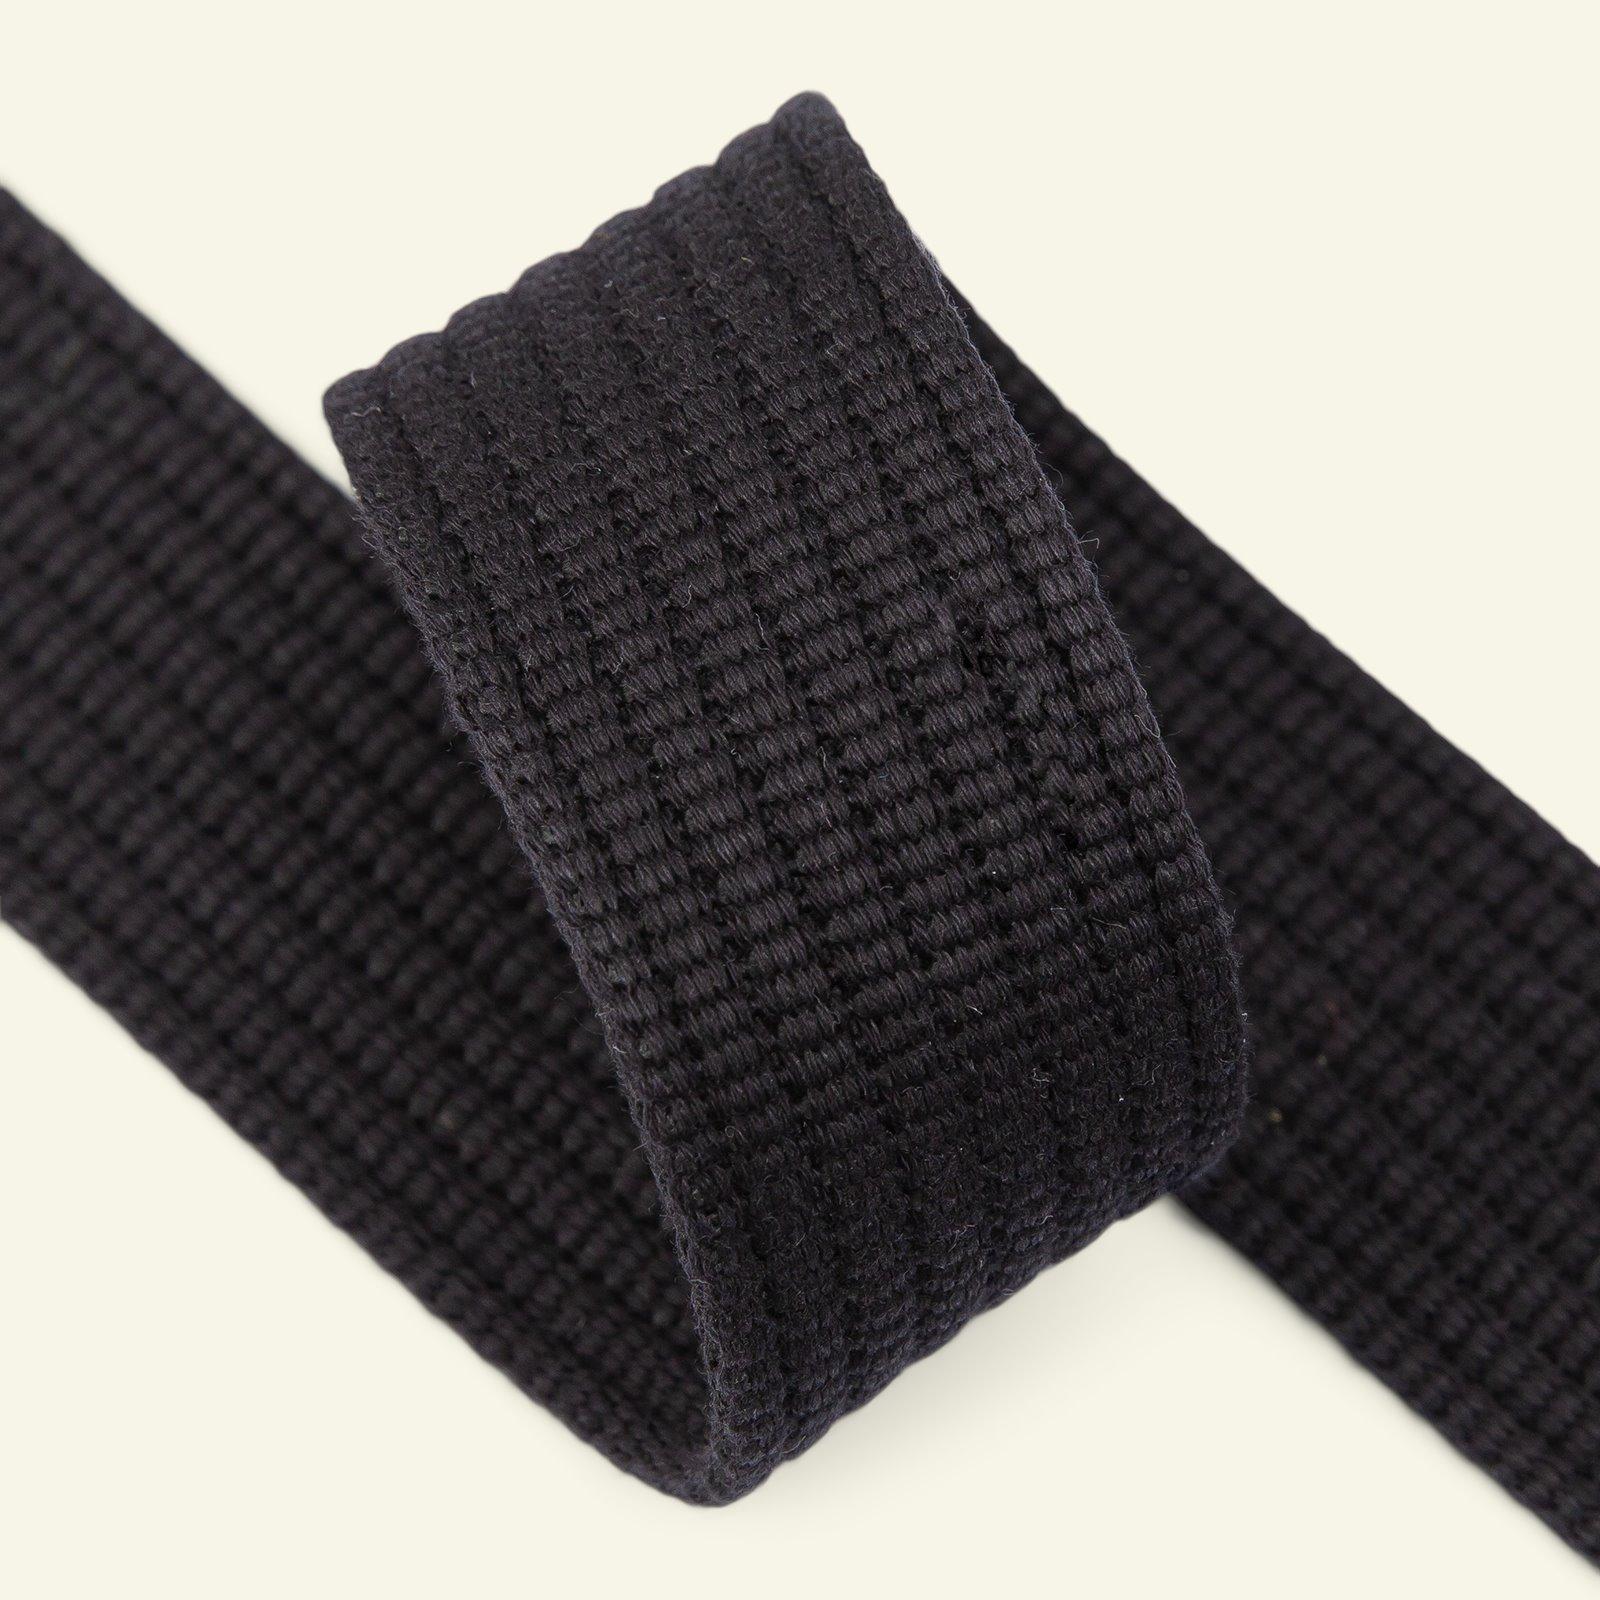 Ribbon woven 40mm black 2m 22406_pack